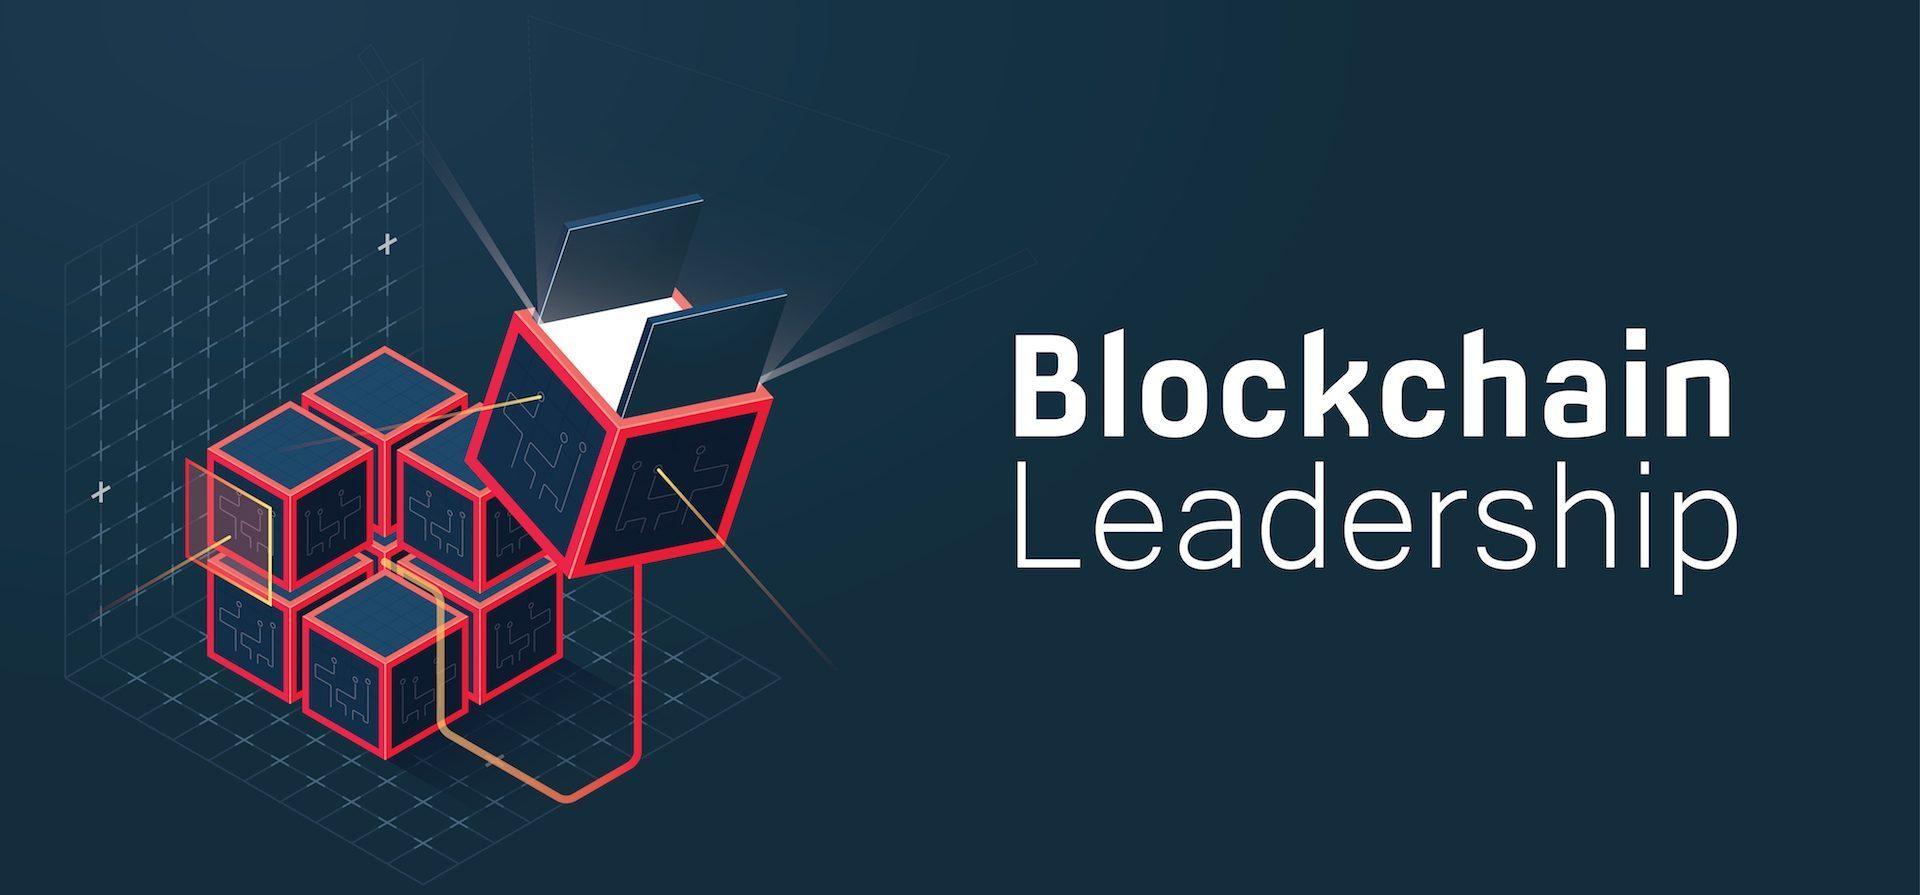 cropped-blockchain-leadership-1-1.jpg